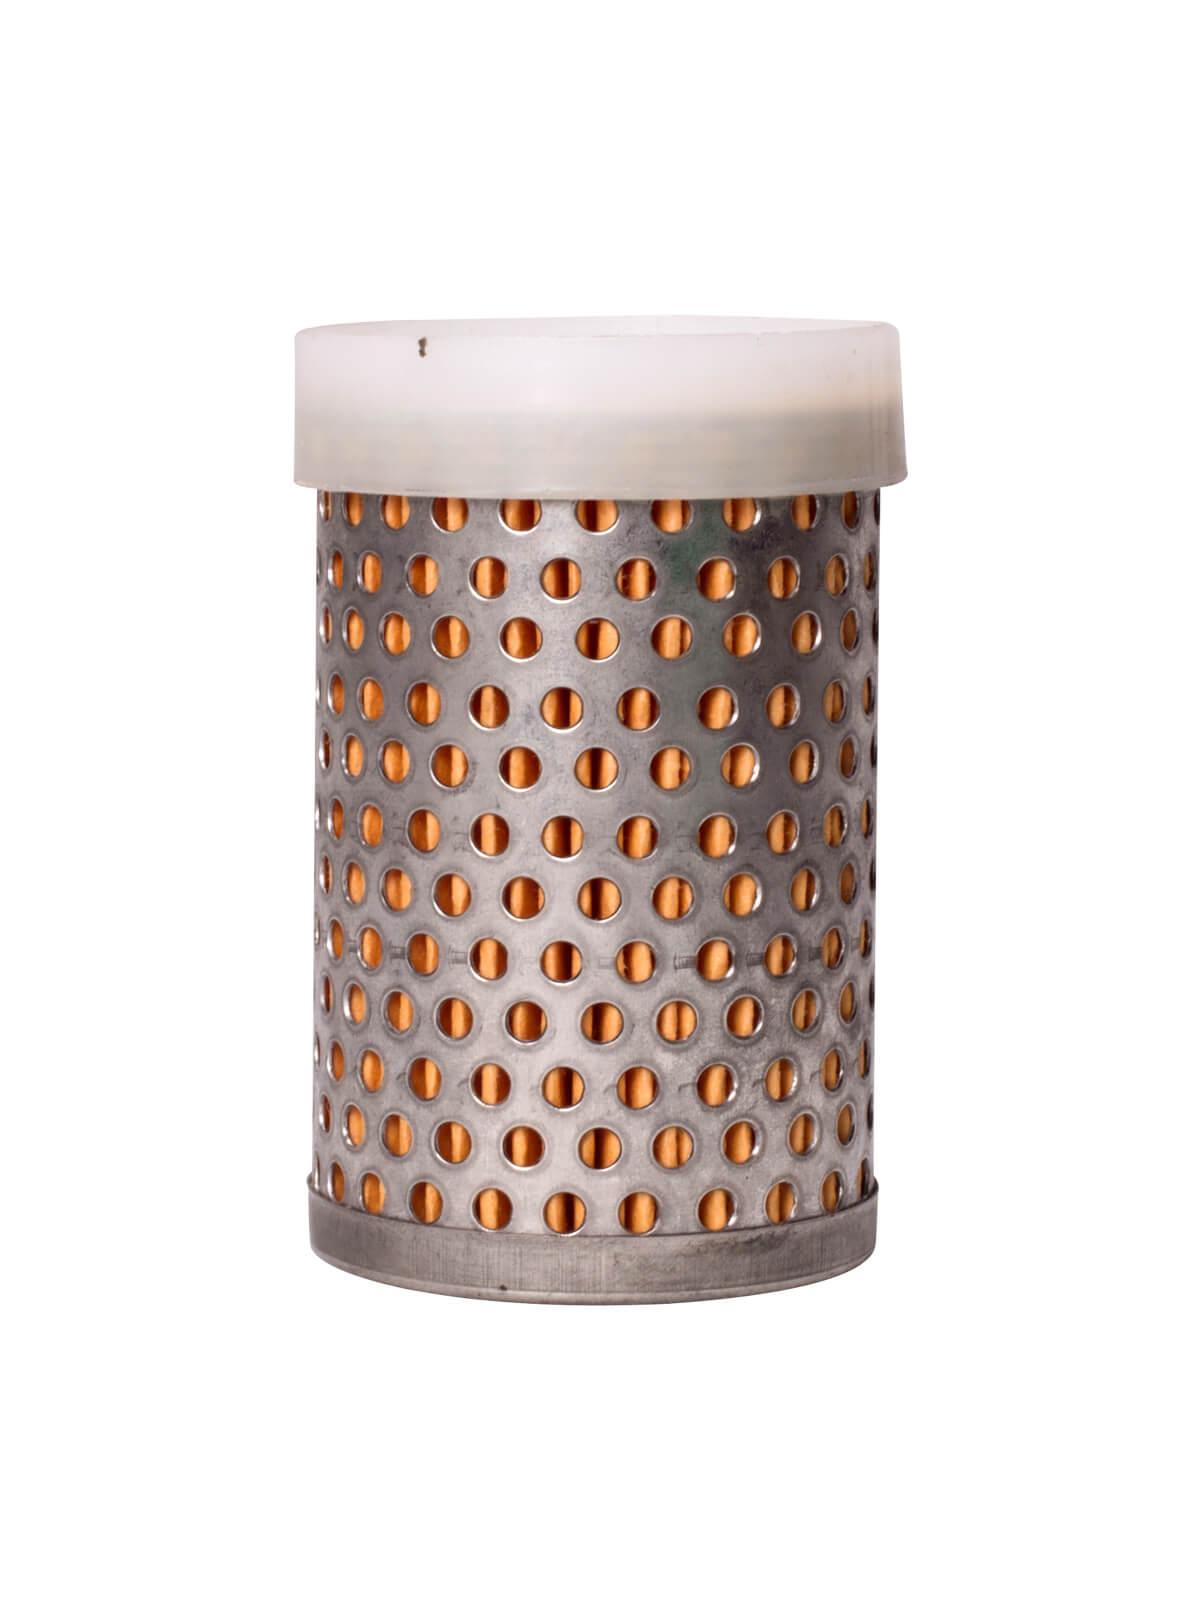 Power Steering Filter (LELYAND U TRUCK 4018 Hydraulic Oil Filter)